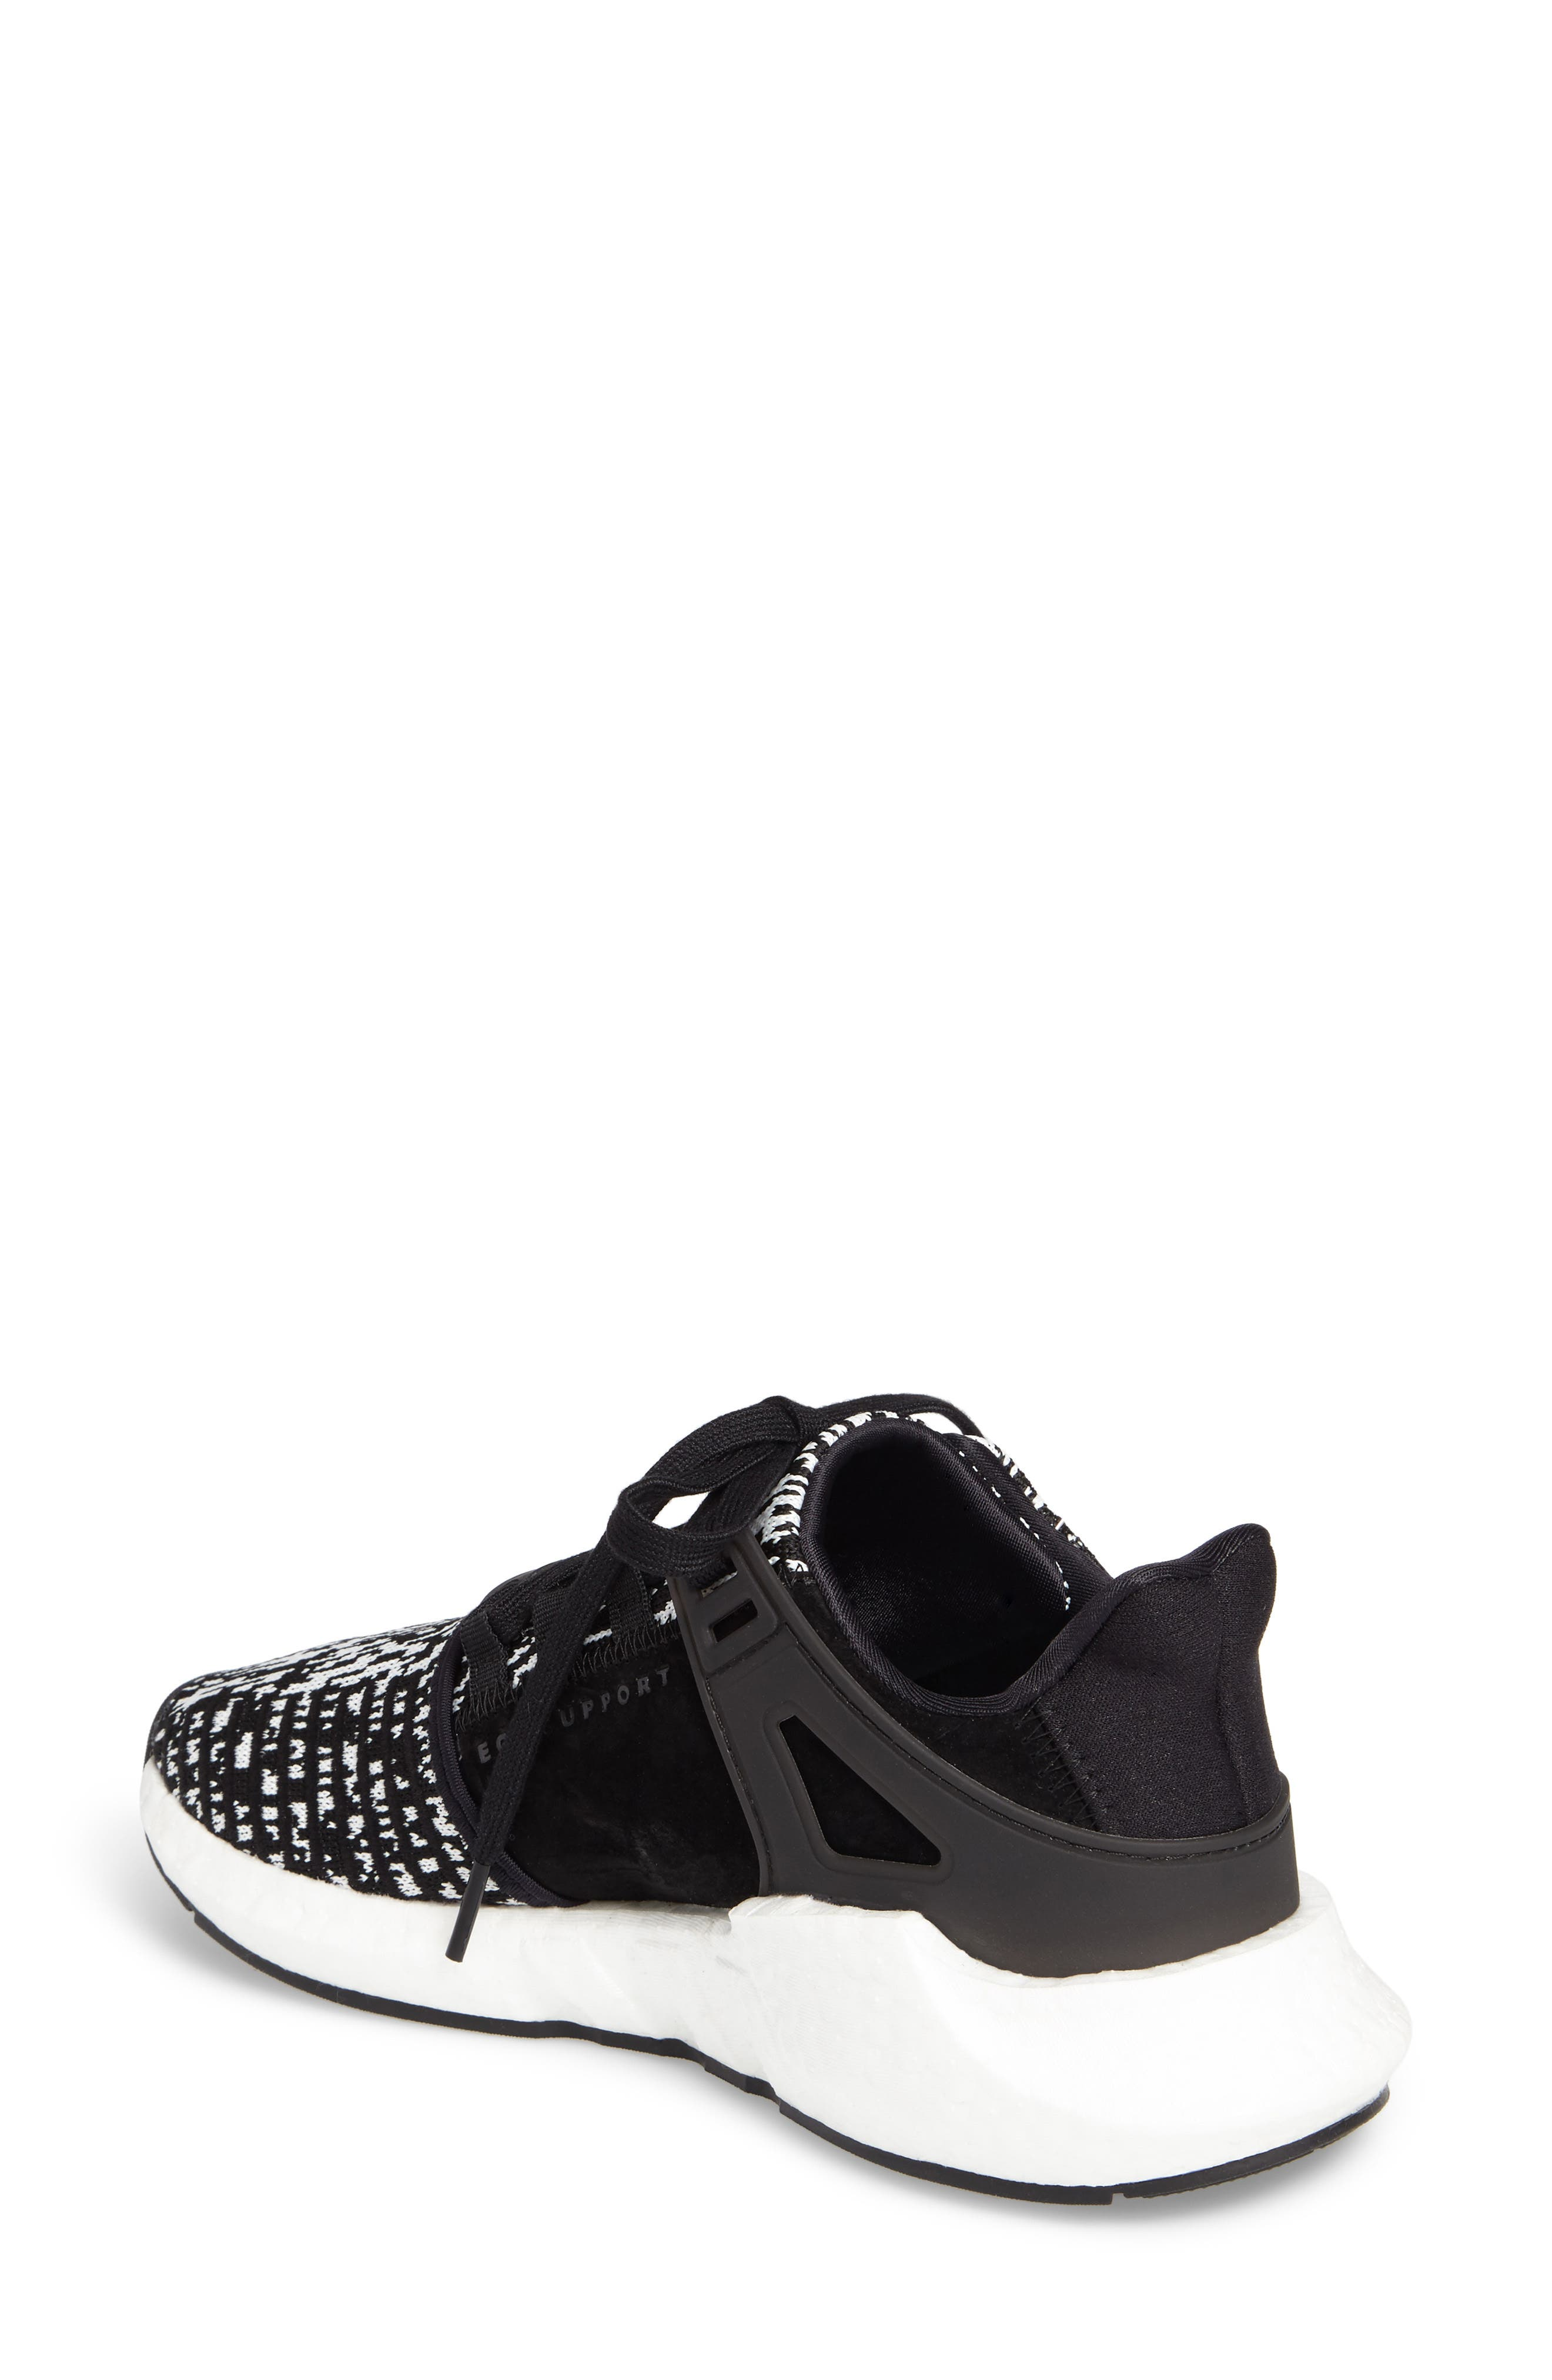 EQT Support 93/17 Sneaker,                             Alternate thumbnail 12, color,